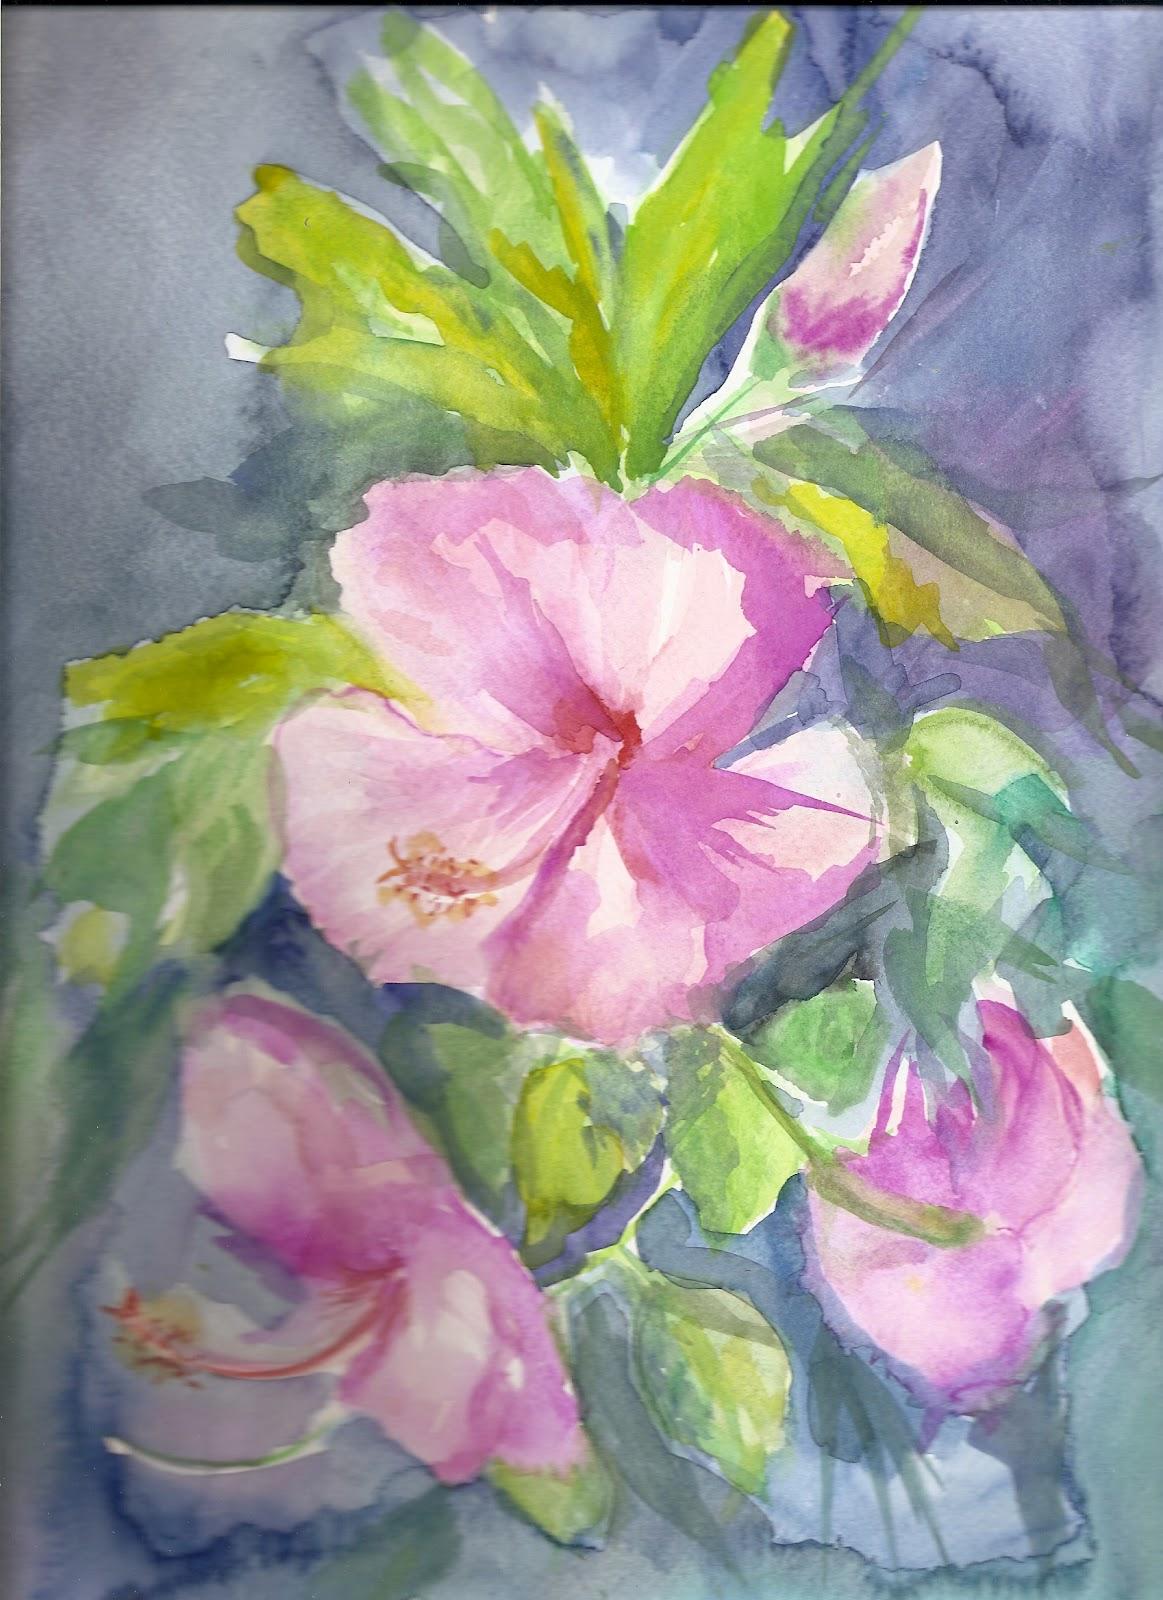 La magia del color rosa china o hibiscus - Rosas chinas ...